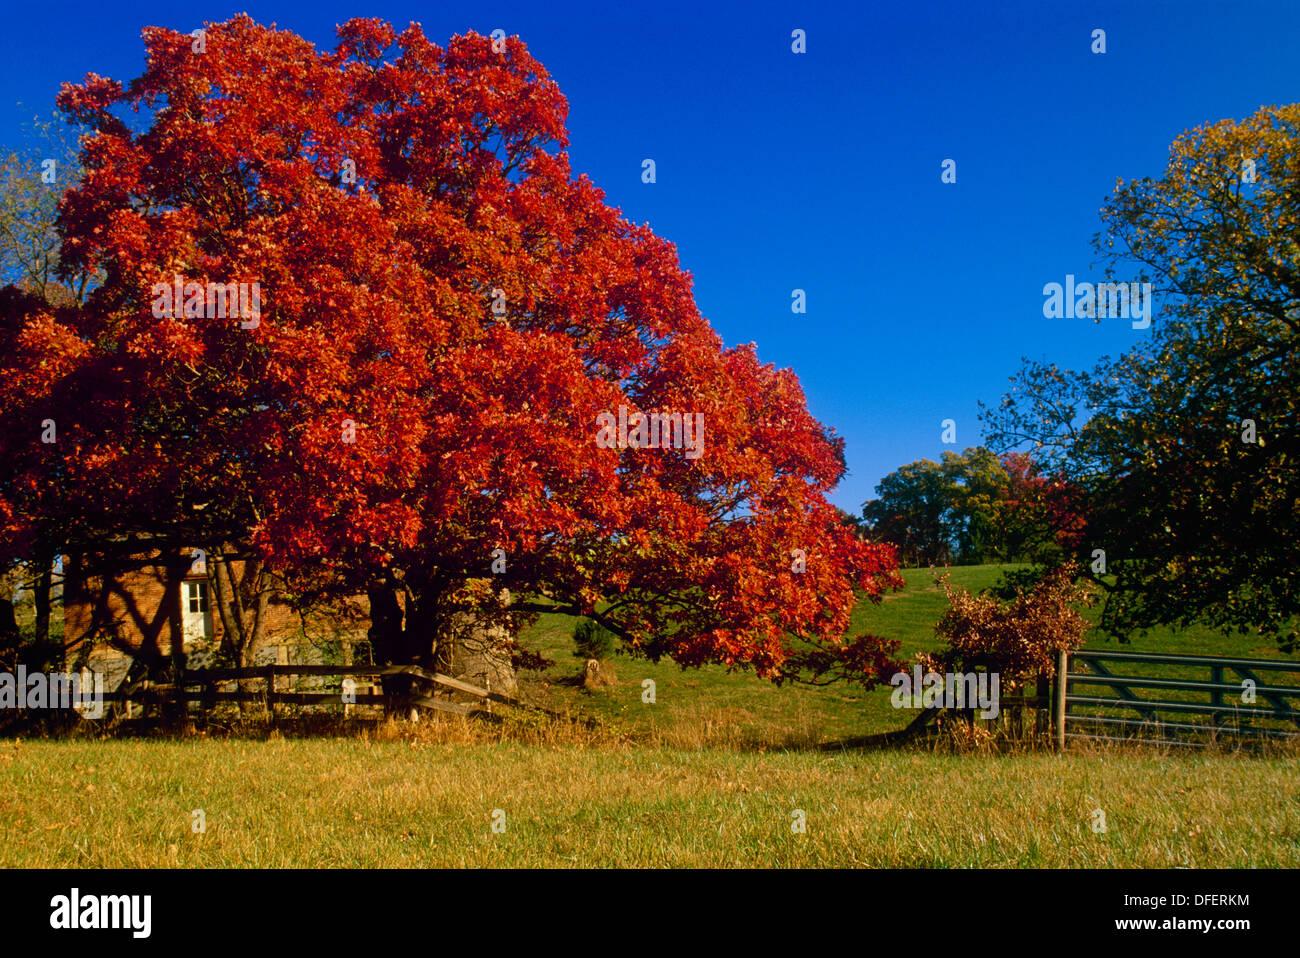 Huge white oak tree quercus alba with autumn foliage in